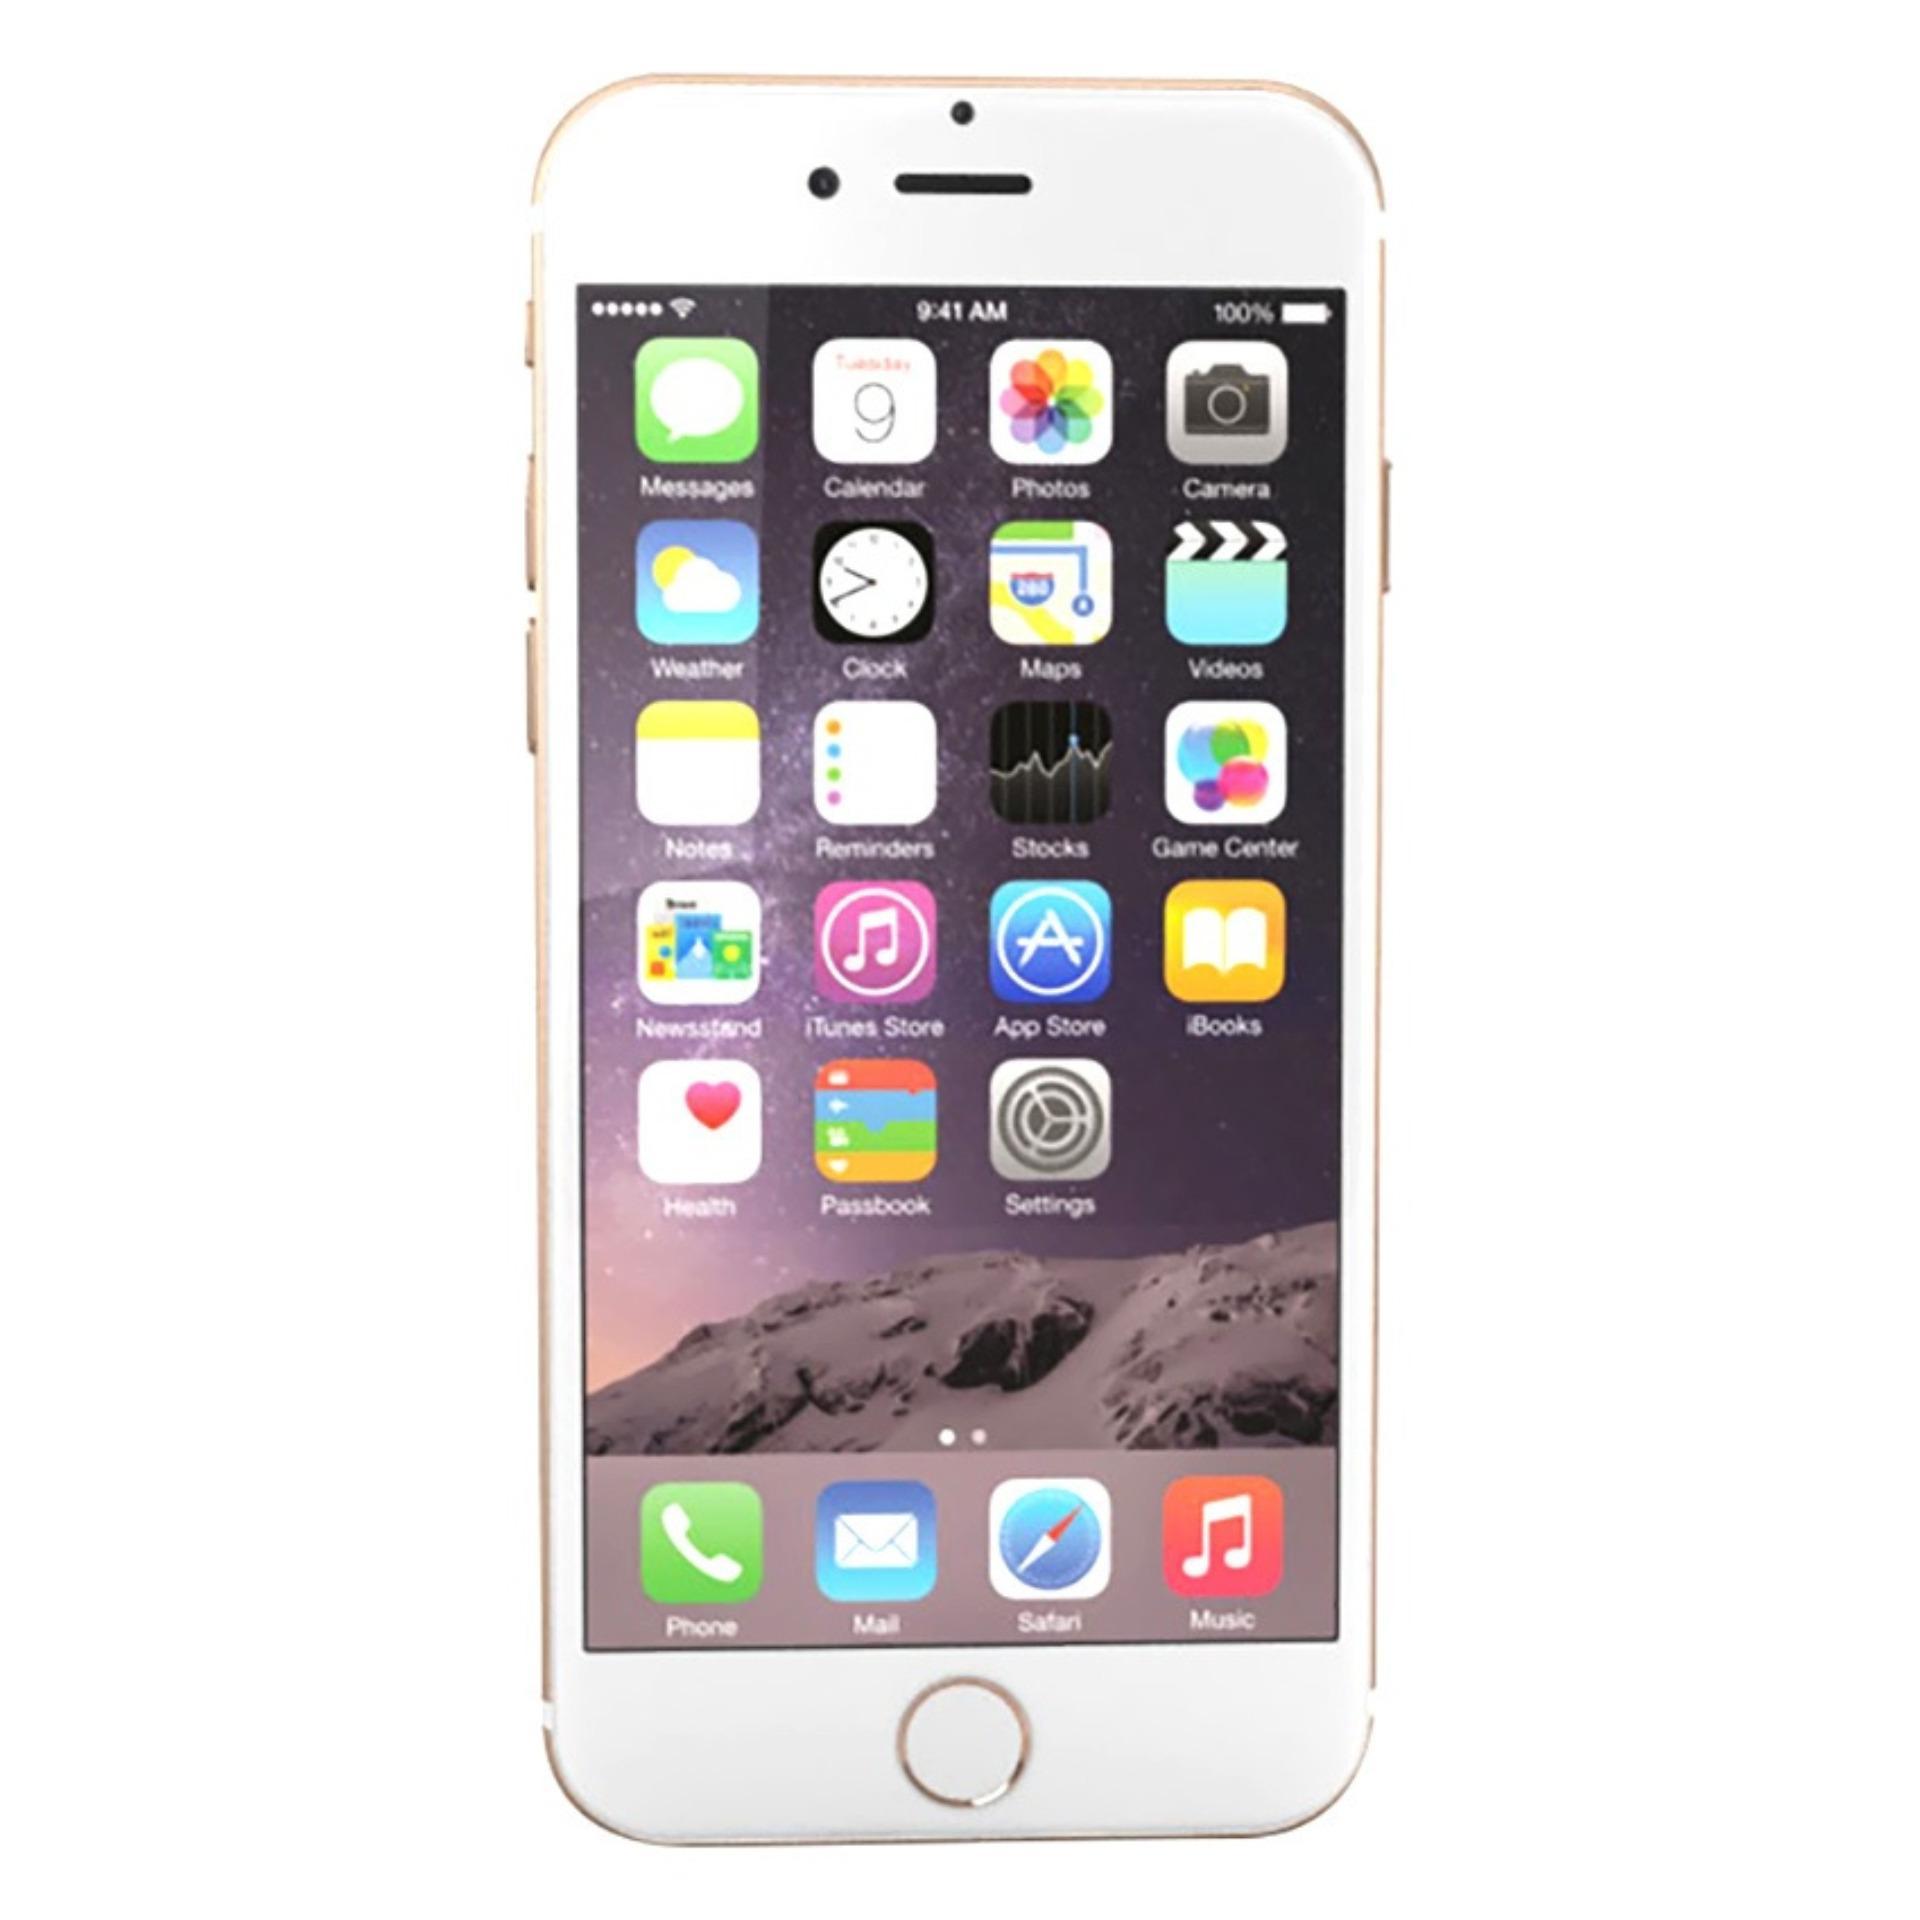 Apple iPhone 6 64 GB Gold- Bisa Cicilan Tanpa Kartu Kredit (kredivo) 9d7a86c910